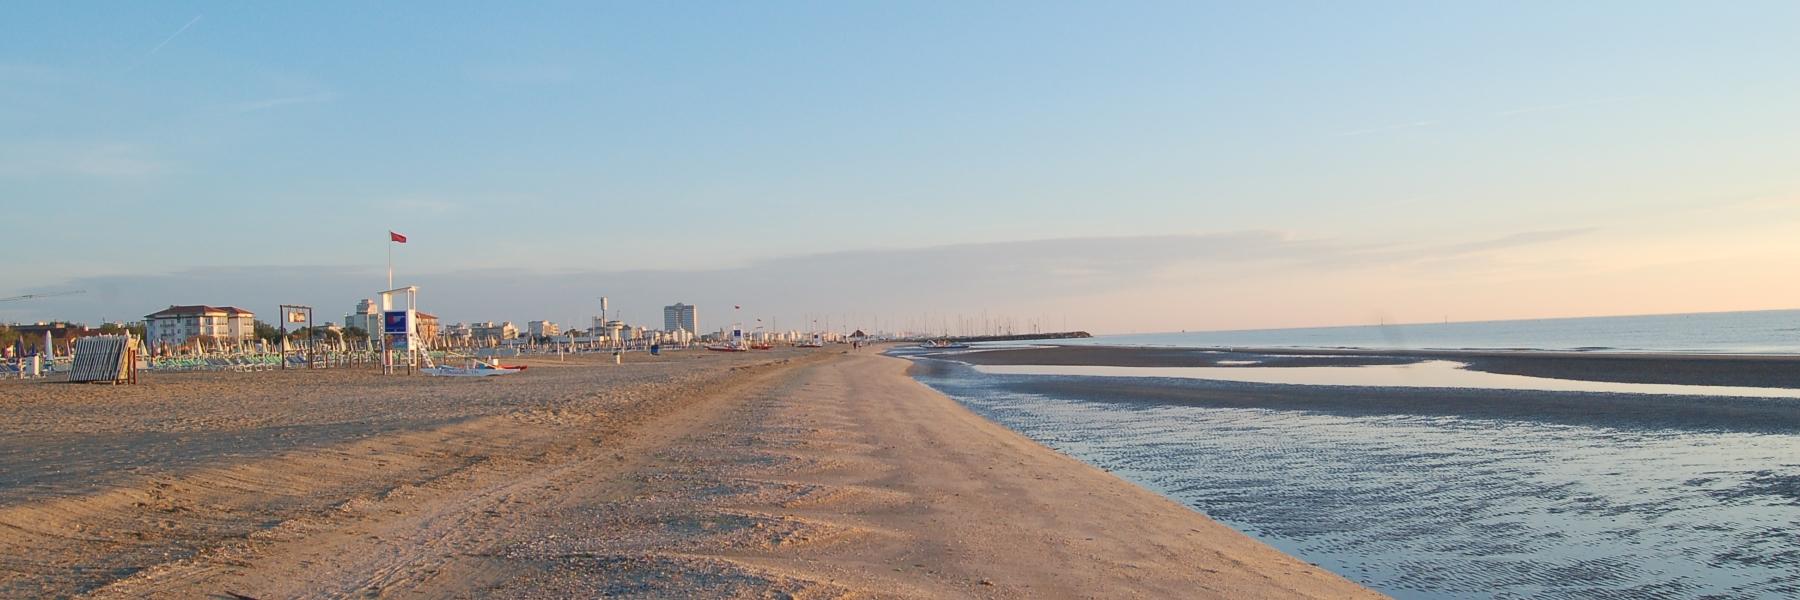 9 km Strand mit WLAN